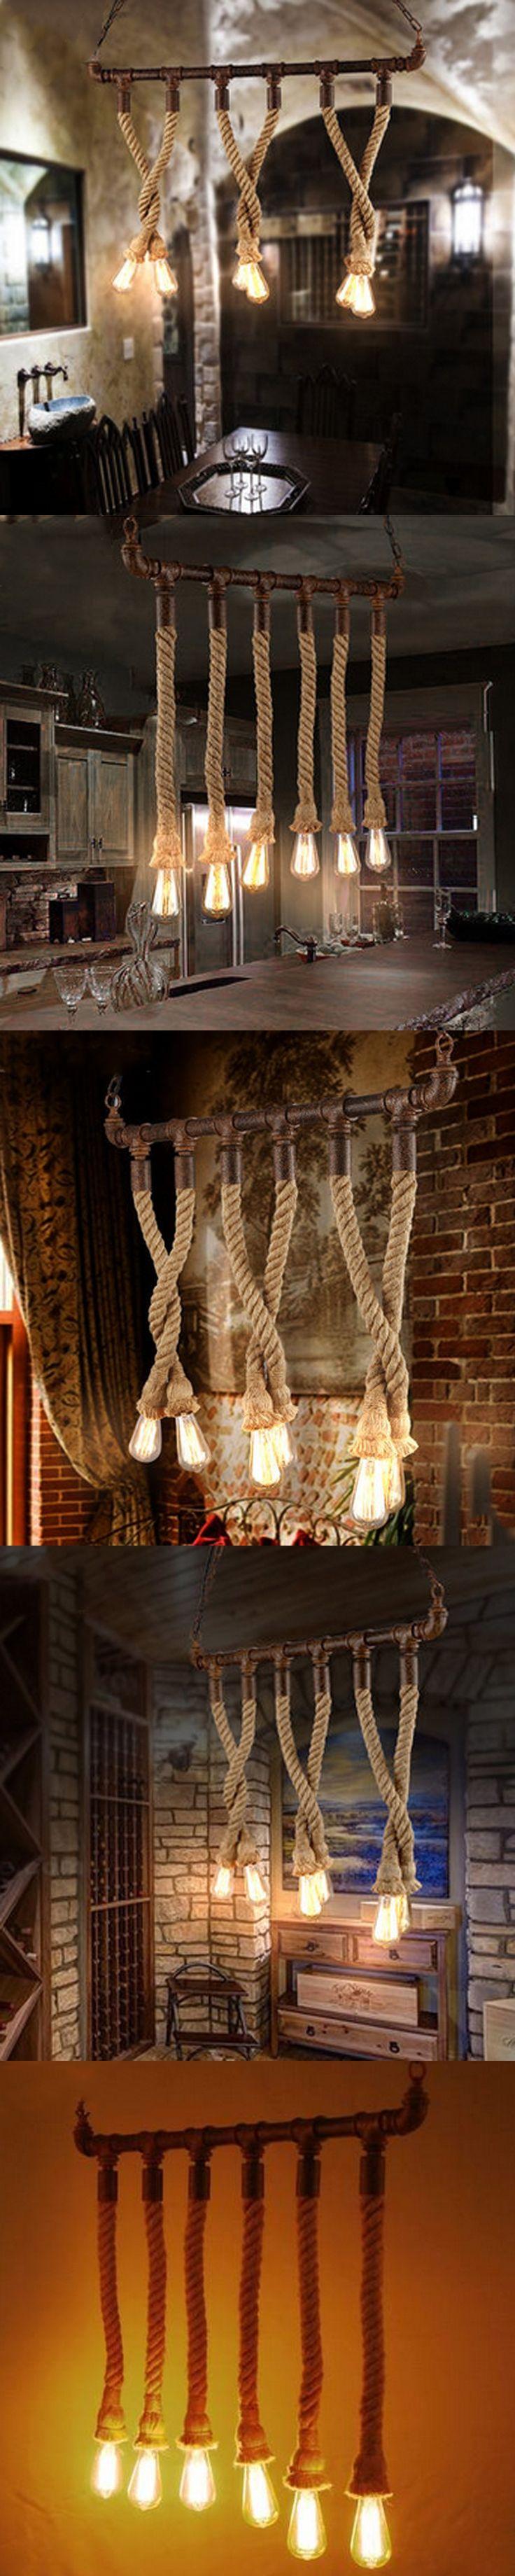 356 best Lights & Lighting images on Pinterest